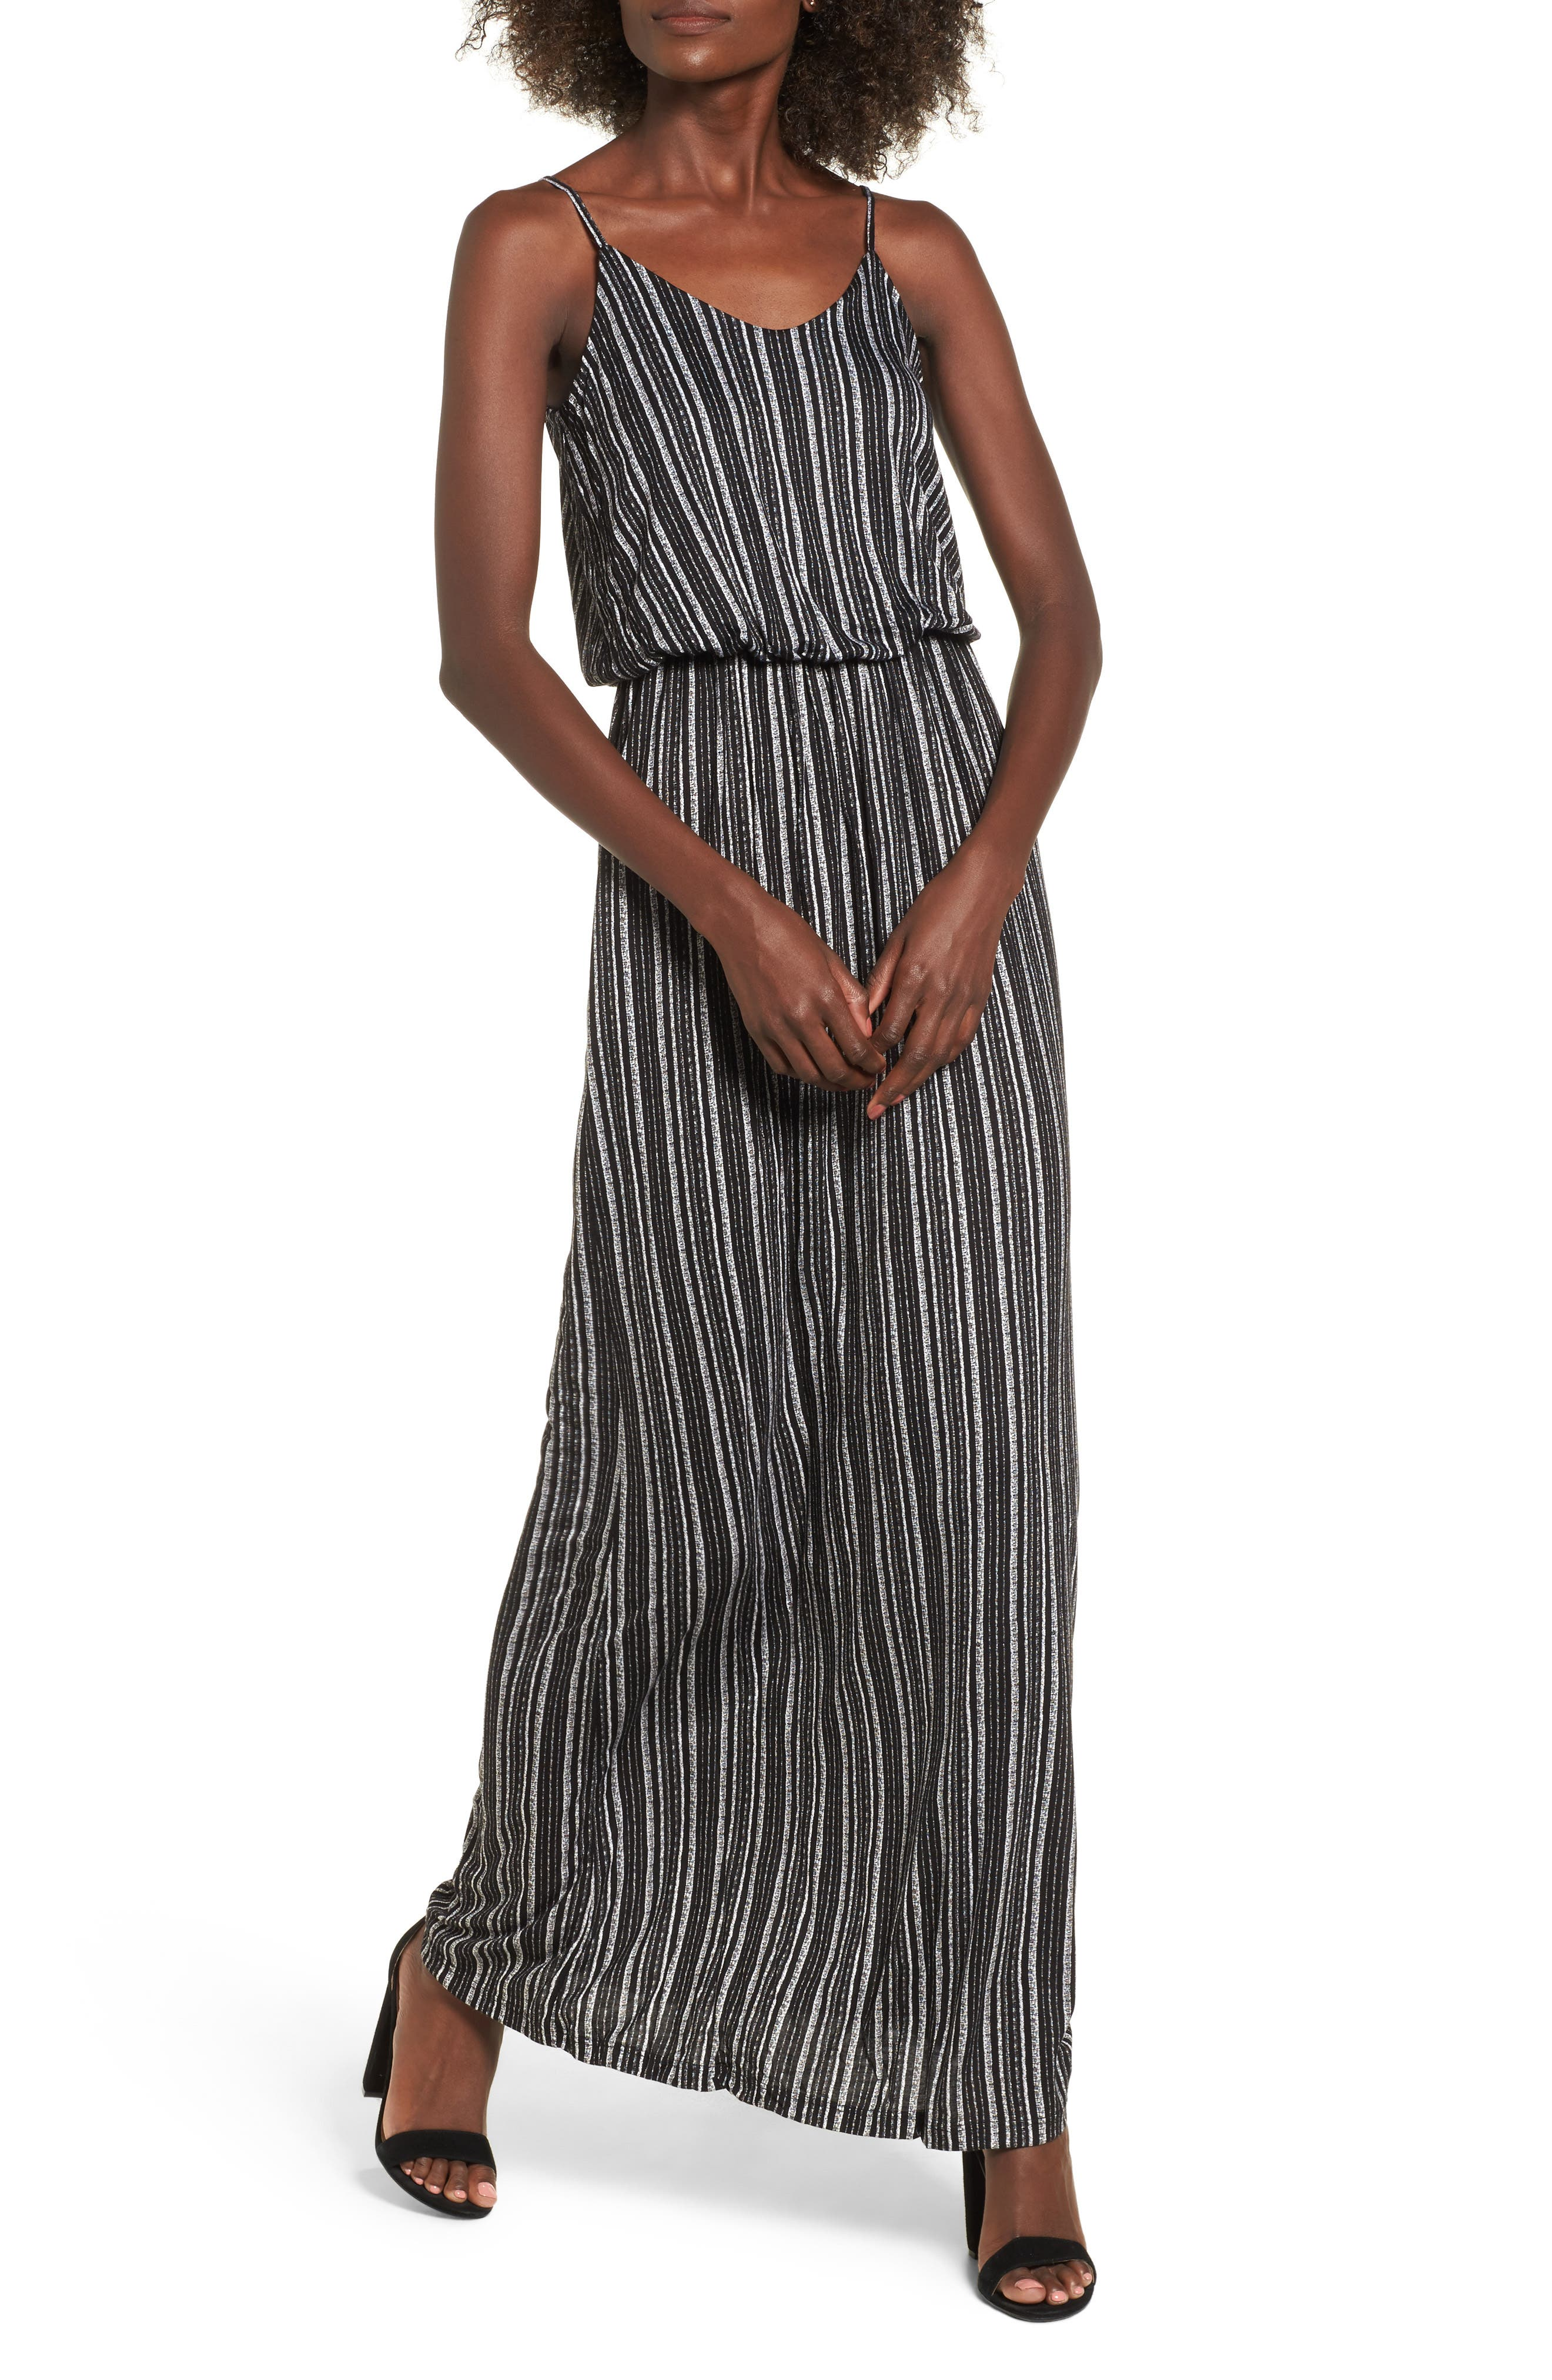 Alternate Image 1 Selected - Lush Knit Maxi Dress